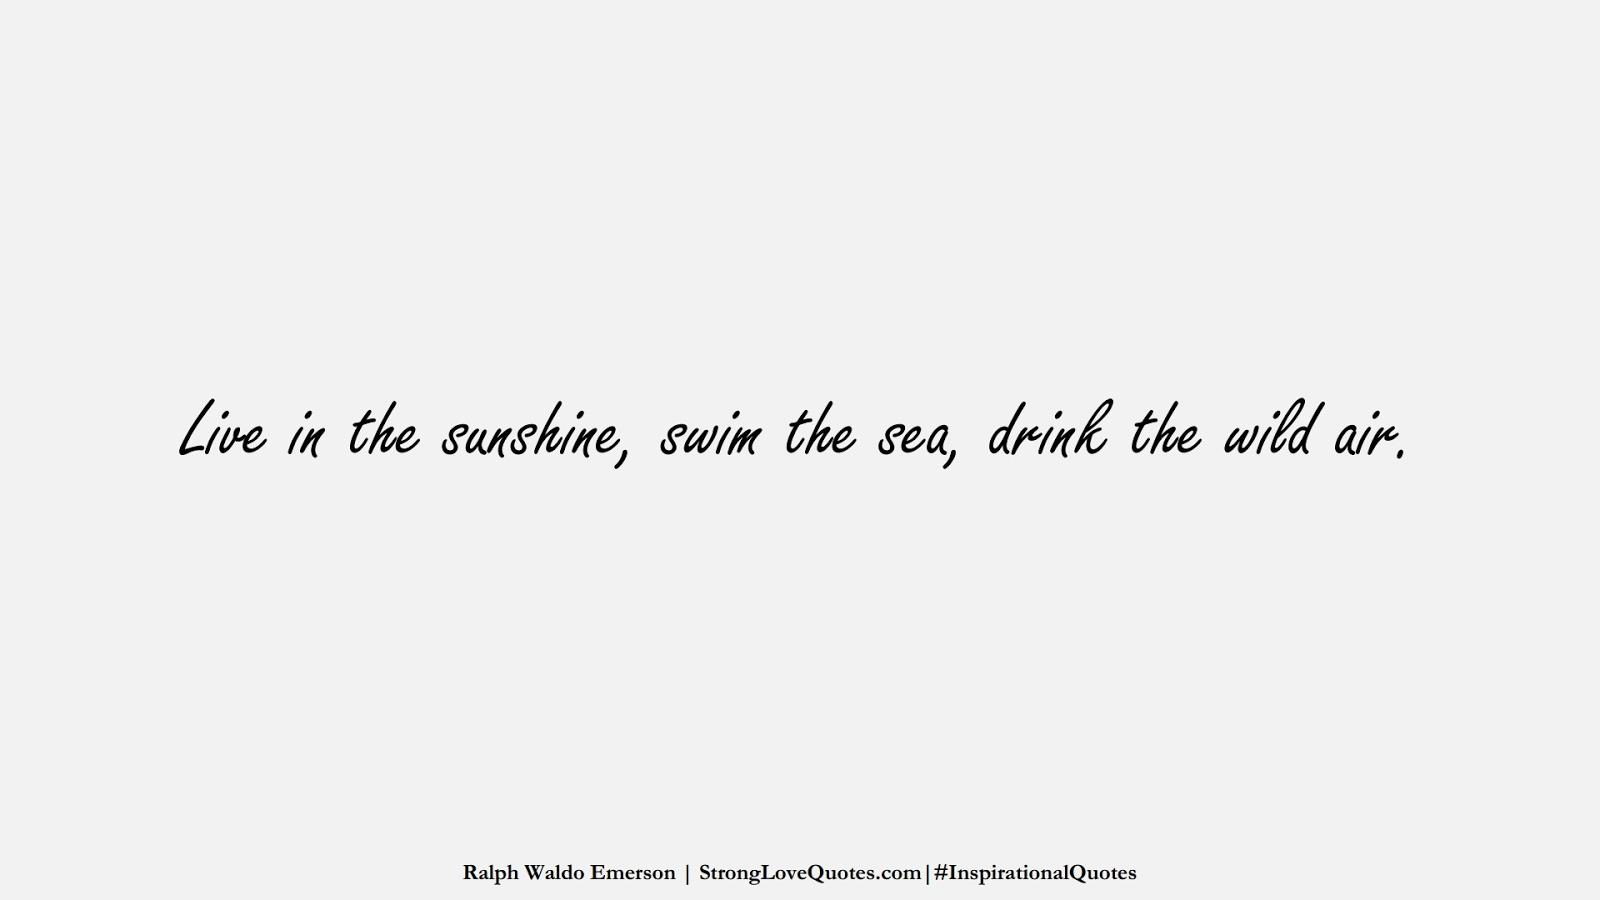 Live in the sunshine, swim the sea, drink the wild air. (Ralph Waldo Emerson);  #InspirationalQuotes